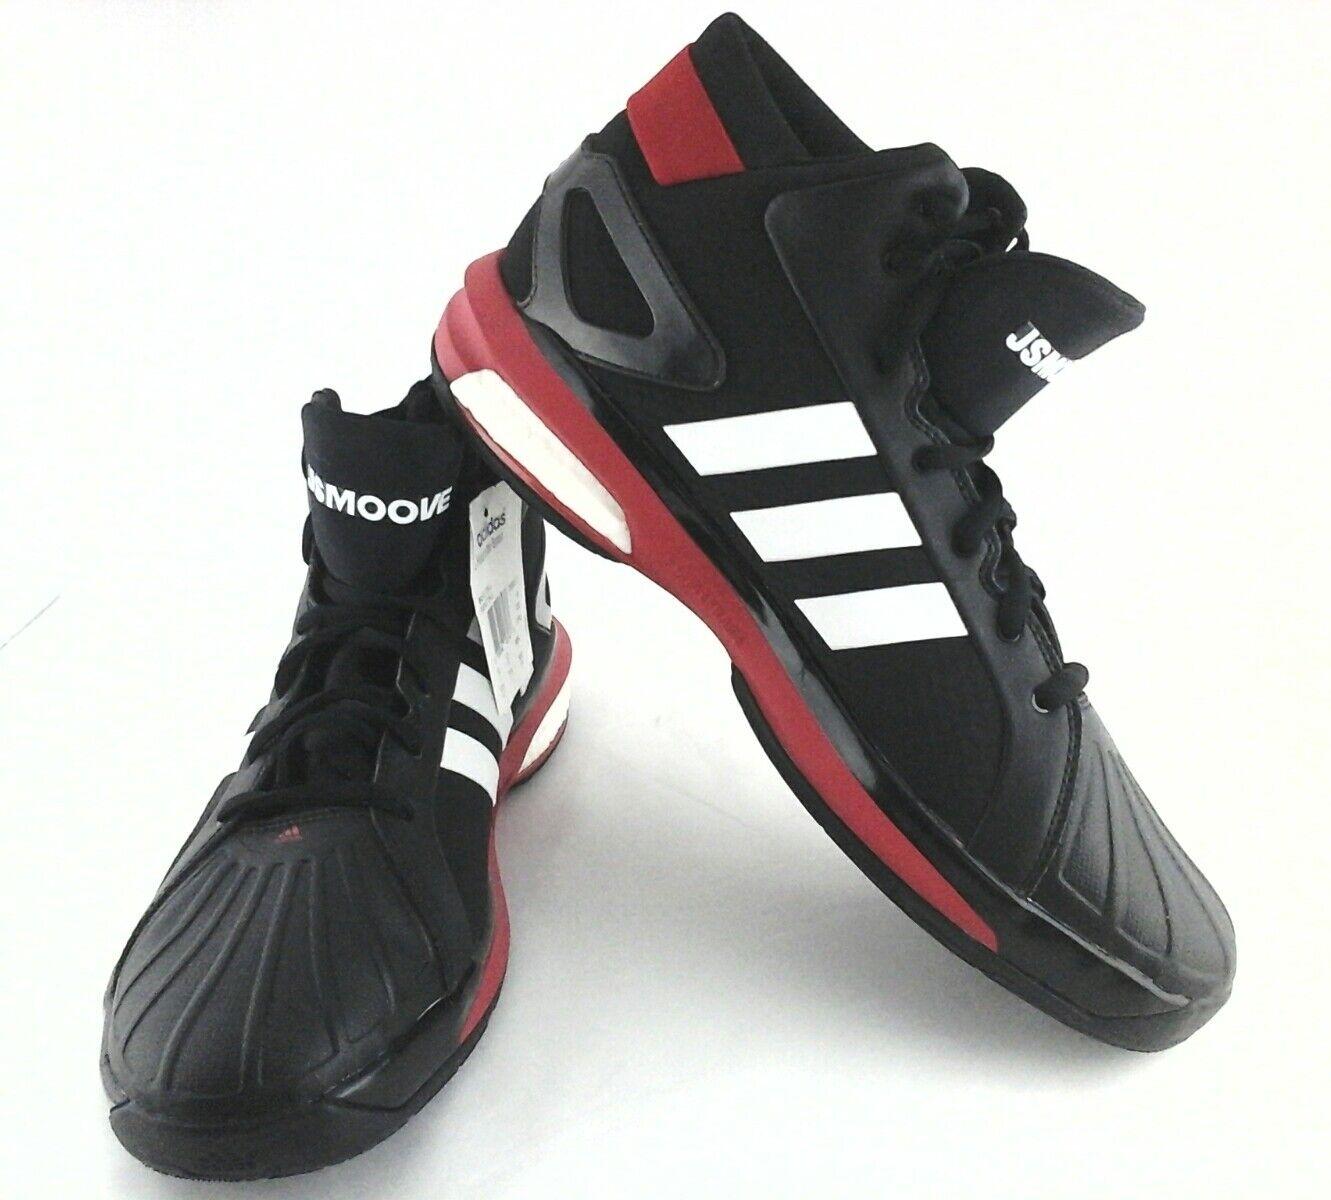 ADIDAS FUTURESTAR BOOST Mens Basketball Shoes Black/White US 13.5 /3 150